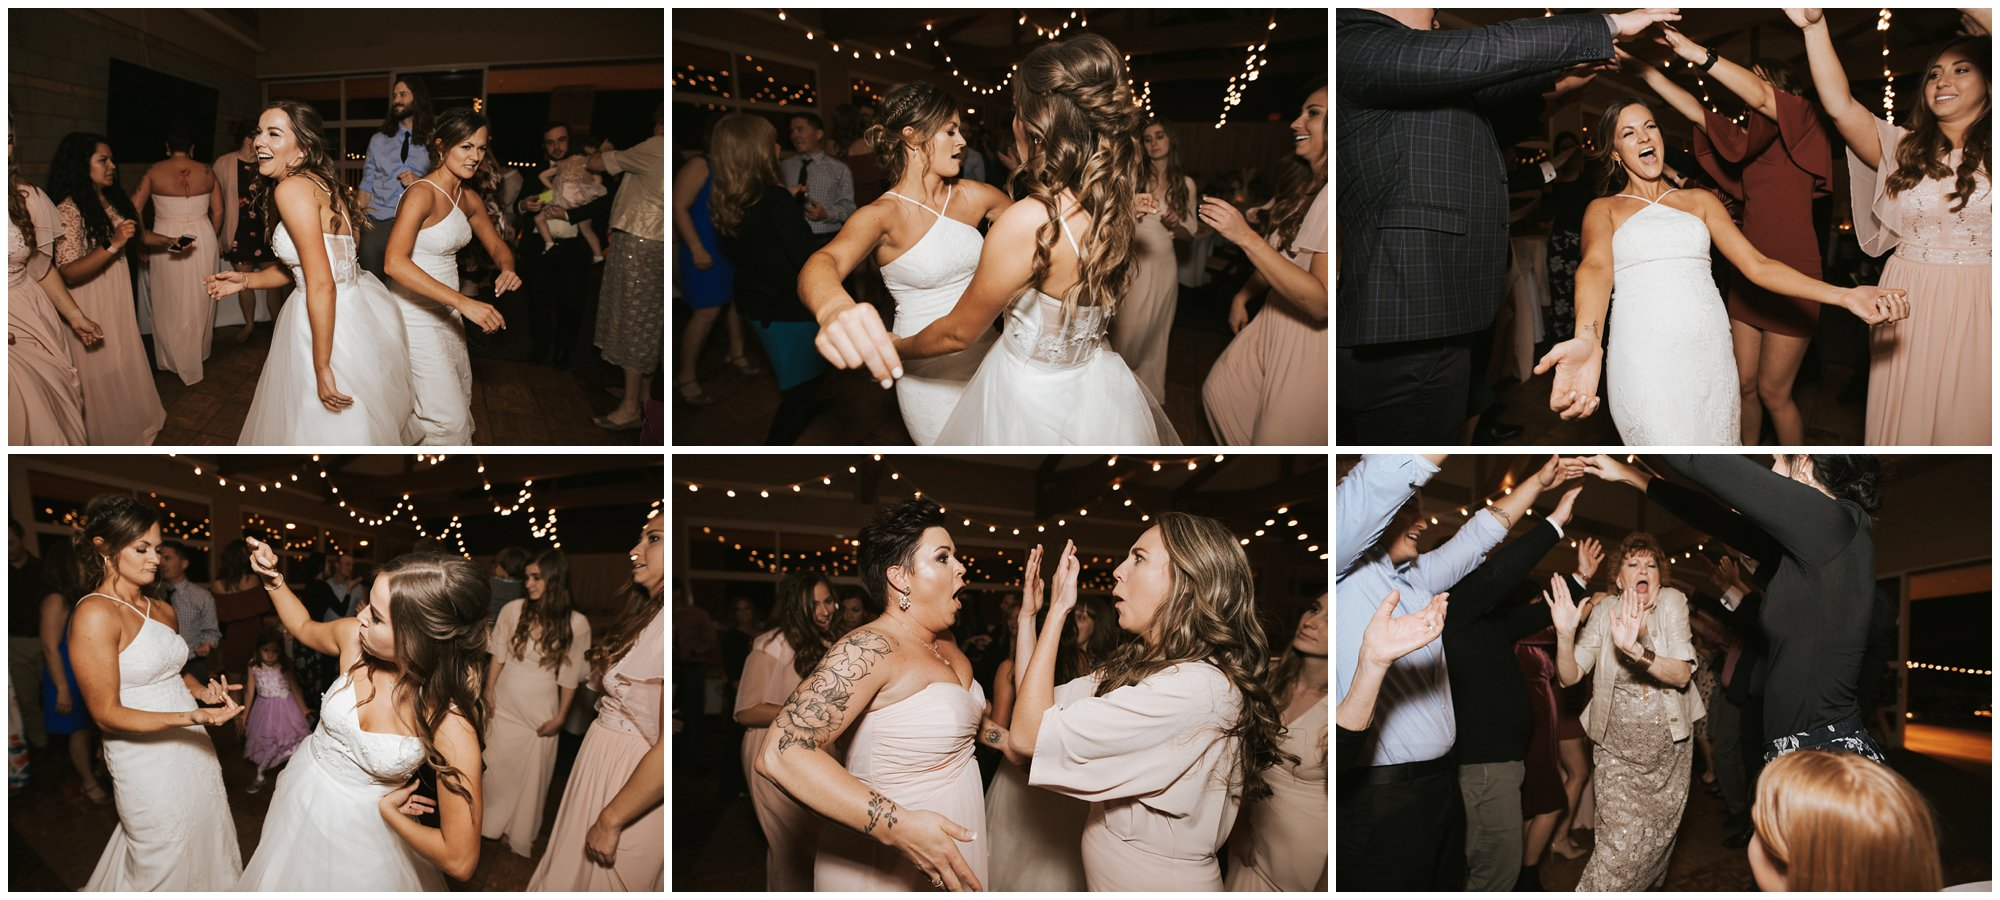 arizona same sex wedding photographer - jenni and lauren wedding the islands clubhouse_0110.jpg